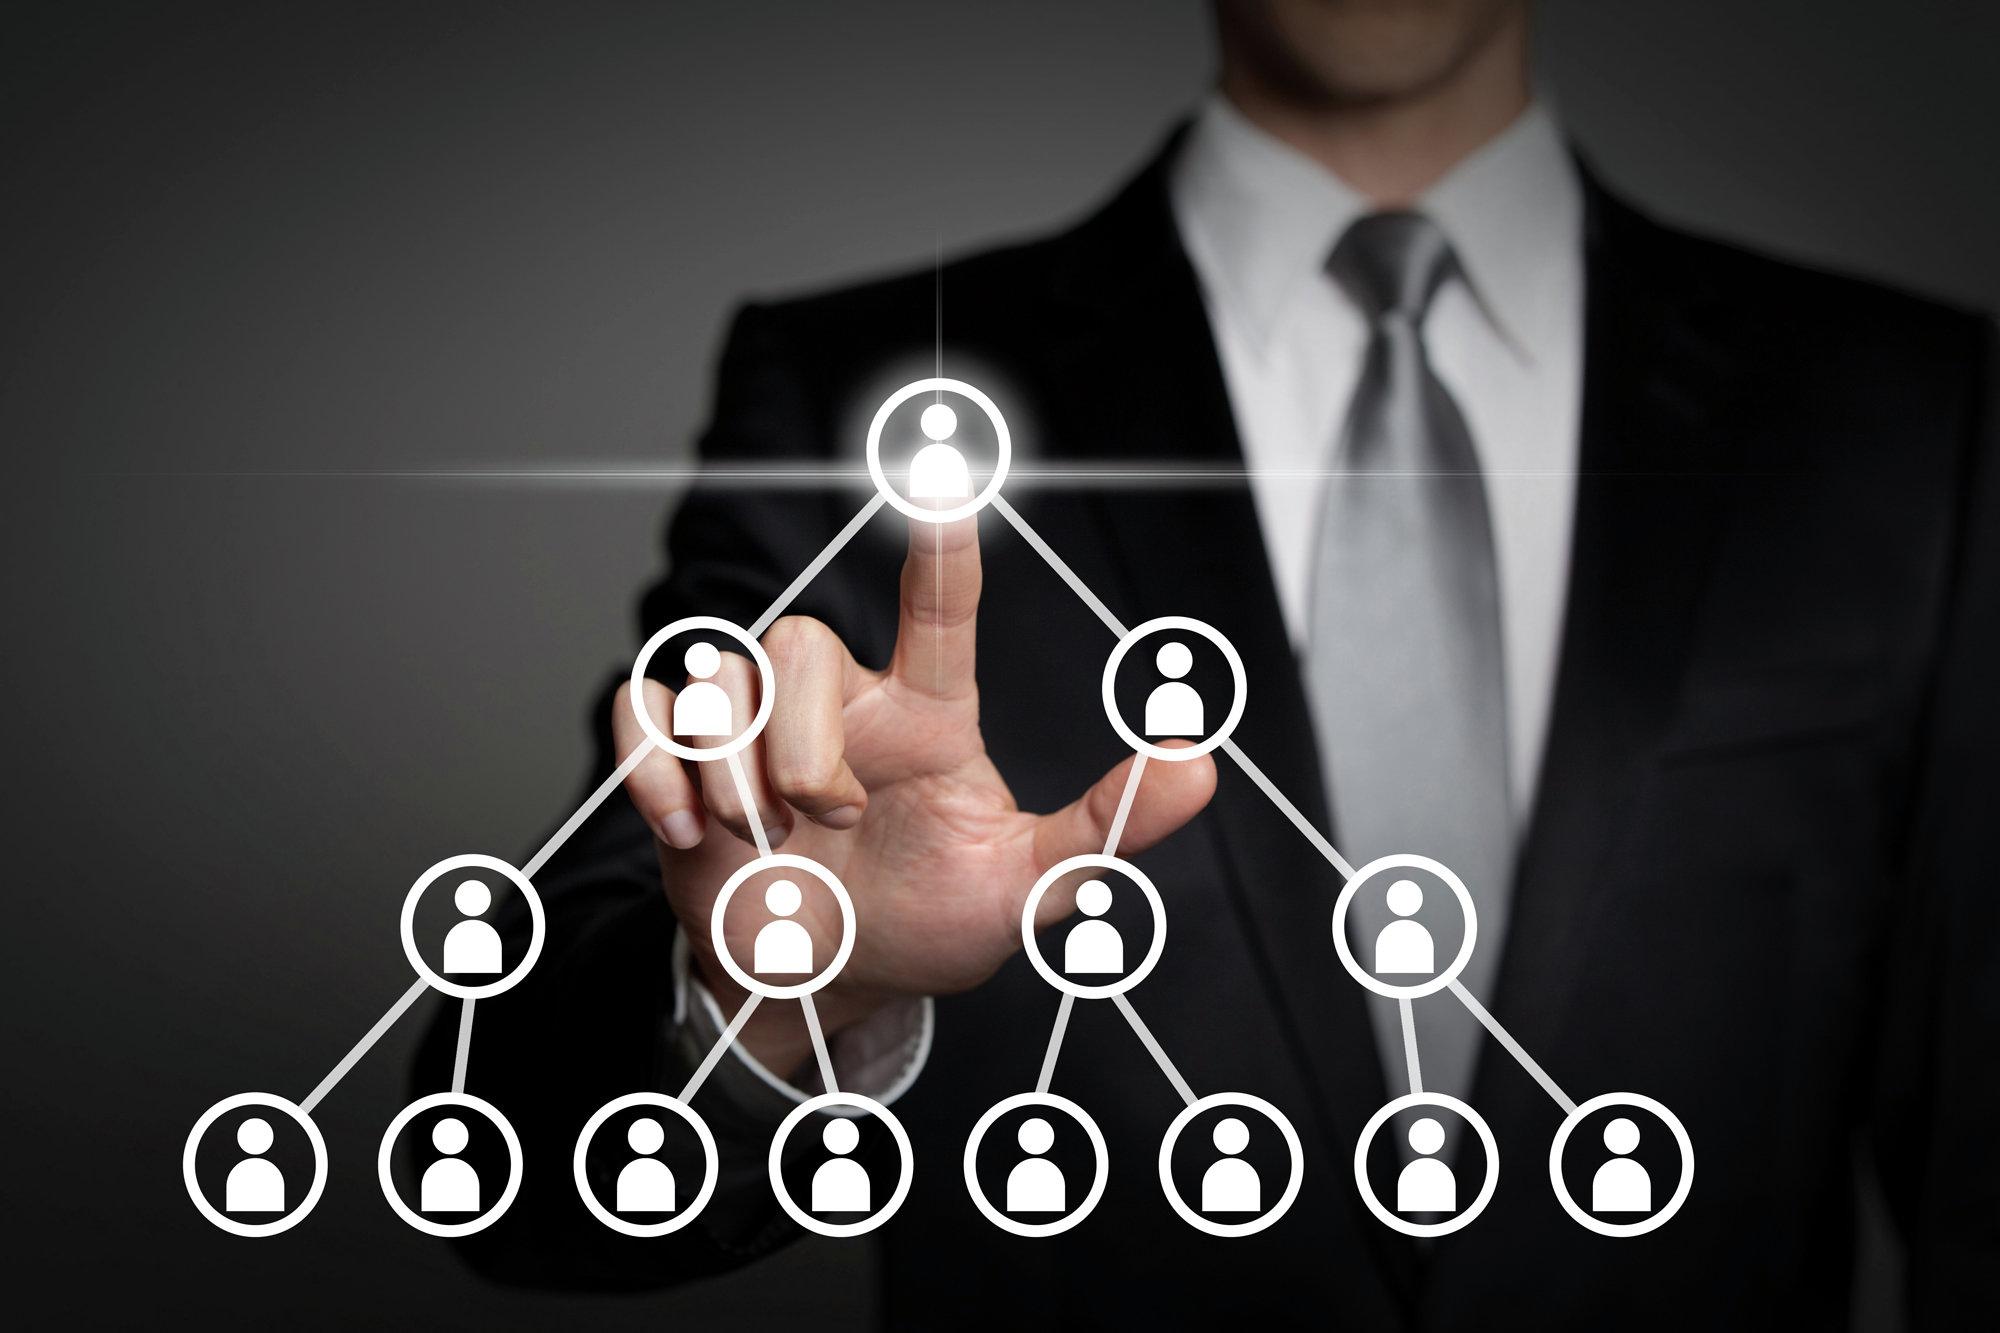 Управление-персоналом-на-предприятии-и-кадровая-политика-предприятия.jpg